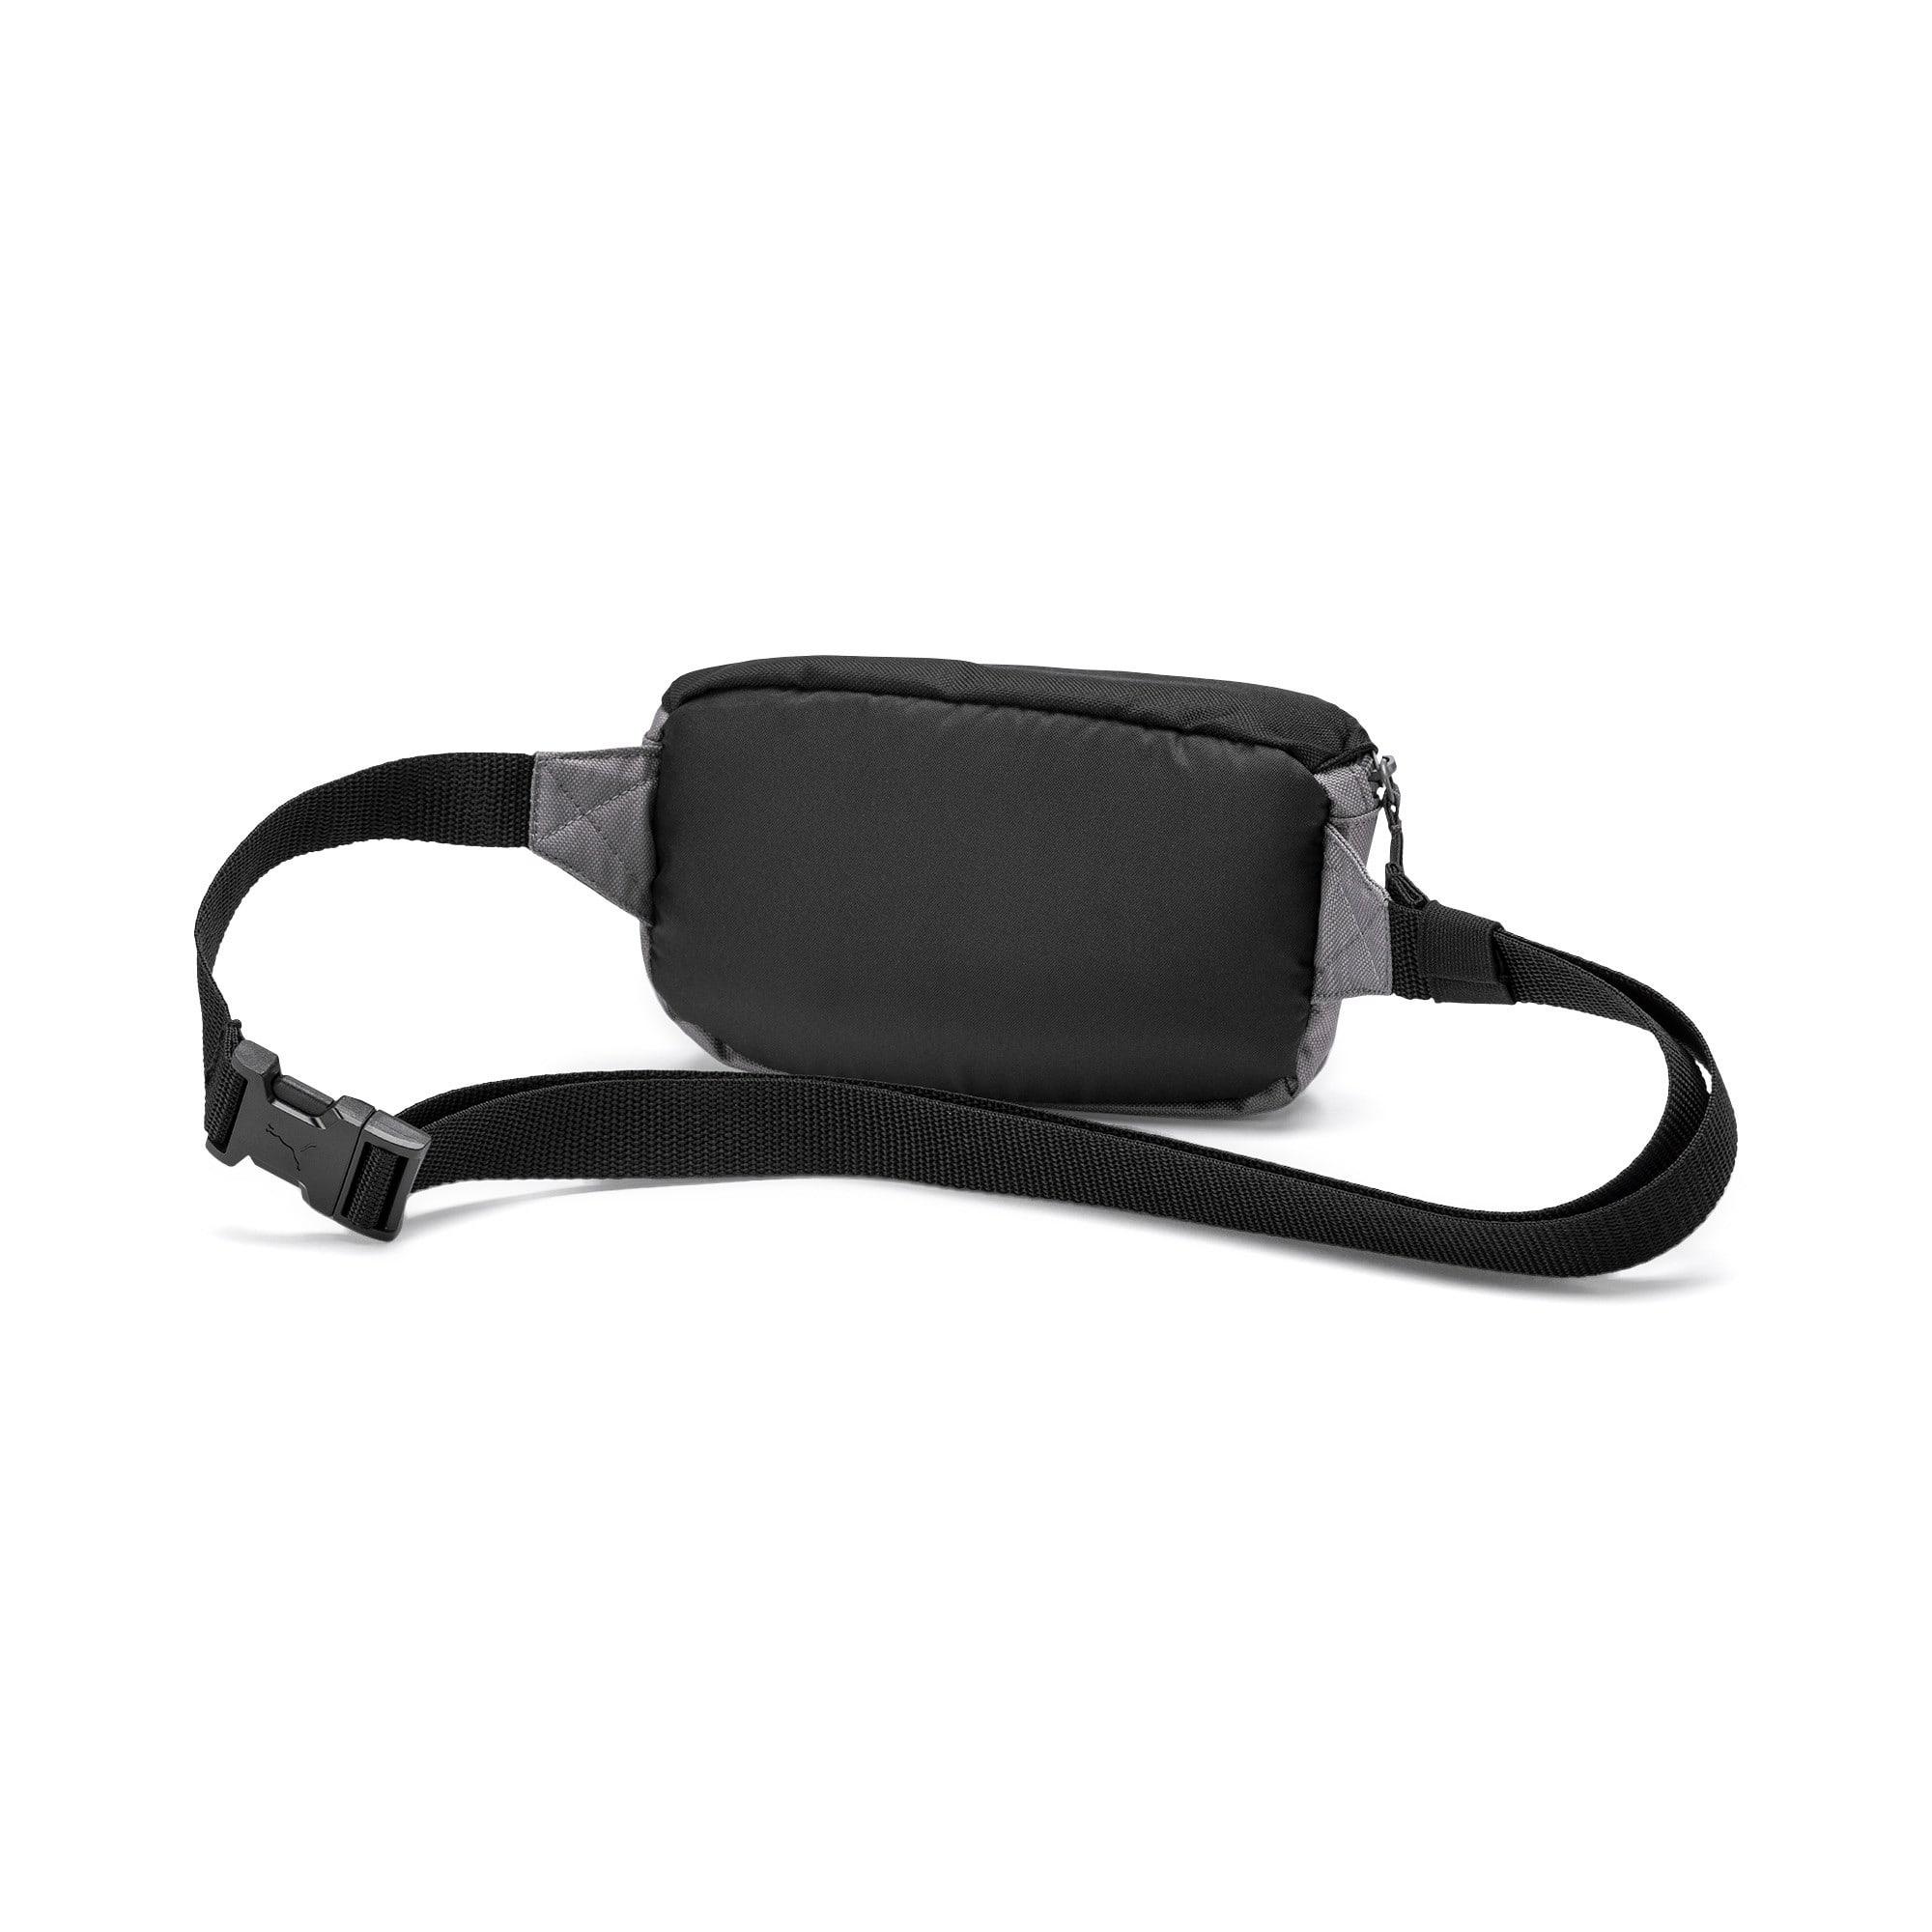 Miniatura 2 de Bolso pequeño para cintura PUMA Plus II, CASTLEROCK-Puma Black, mediano